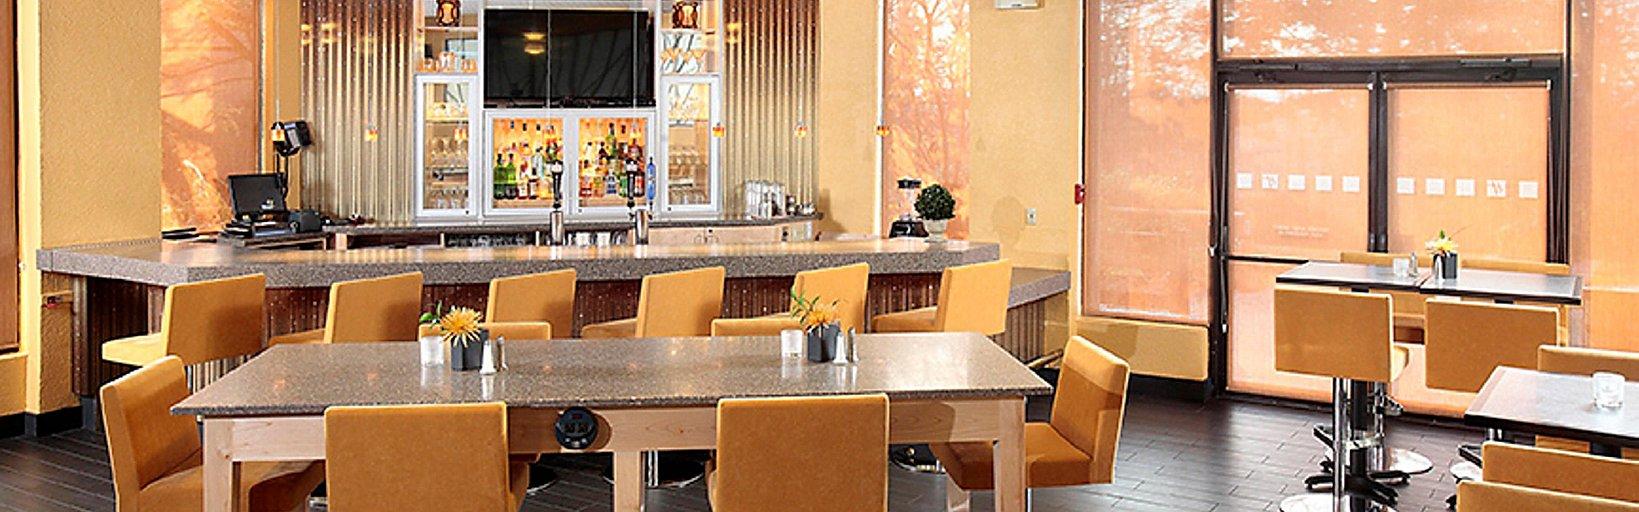 Restaurants Near Holiday Inn Wilkes Barre East Mountain